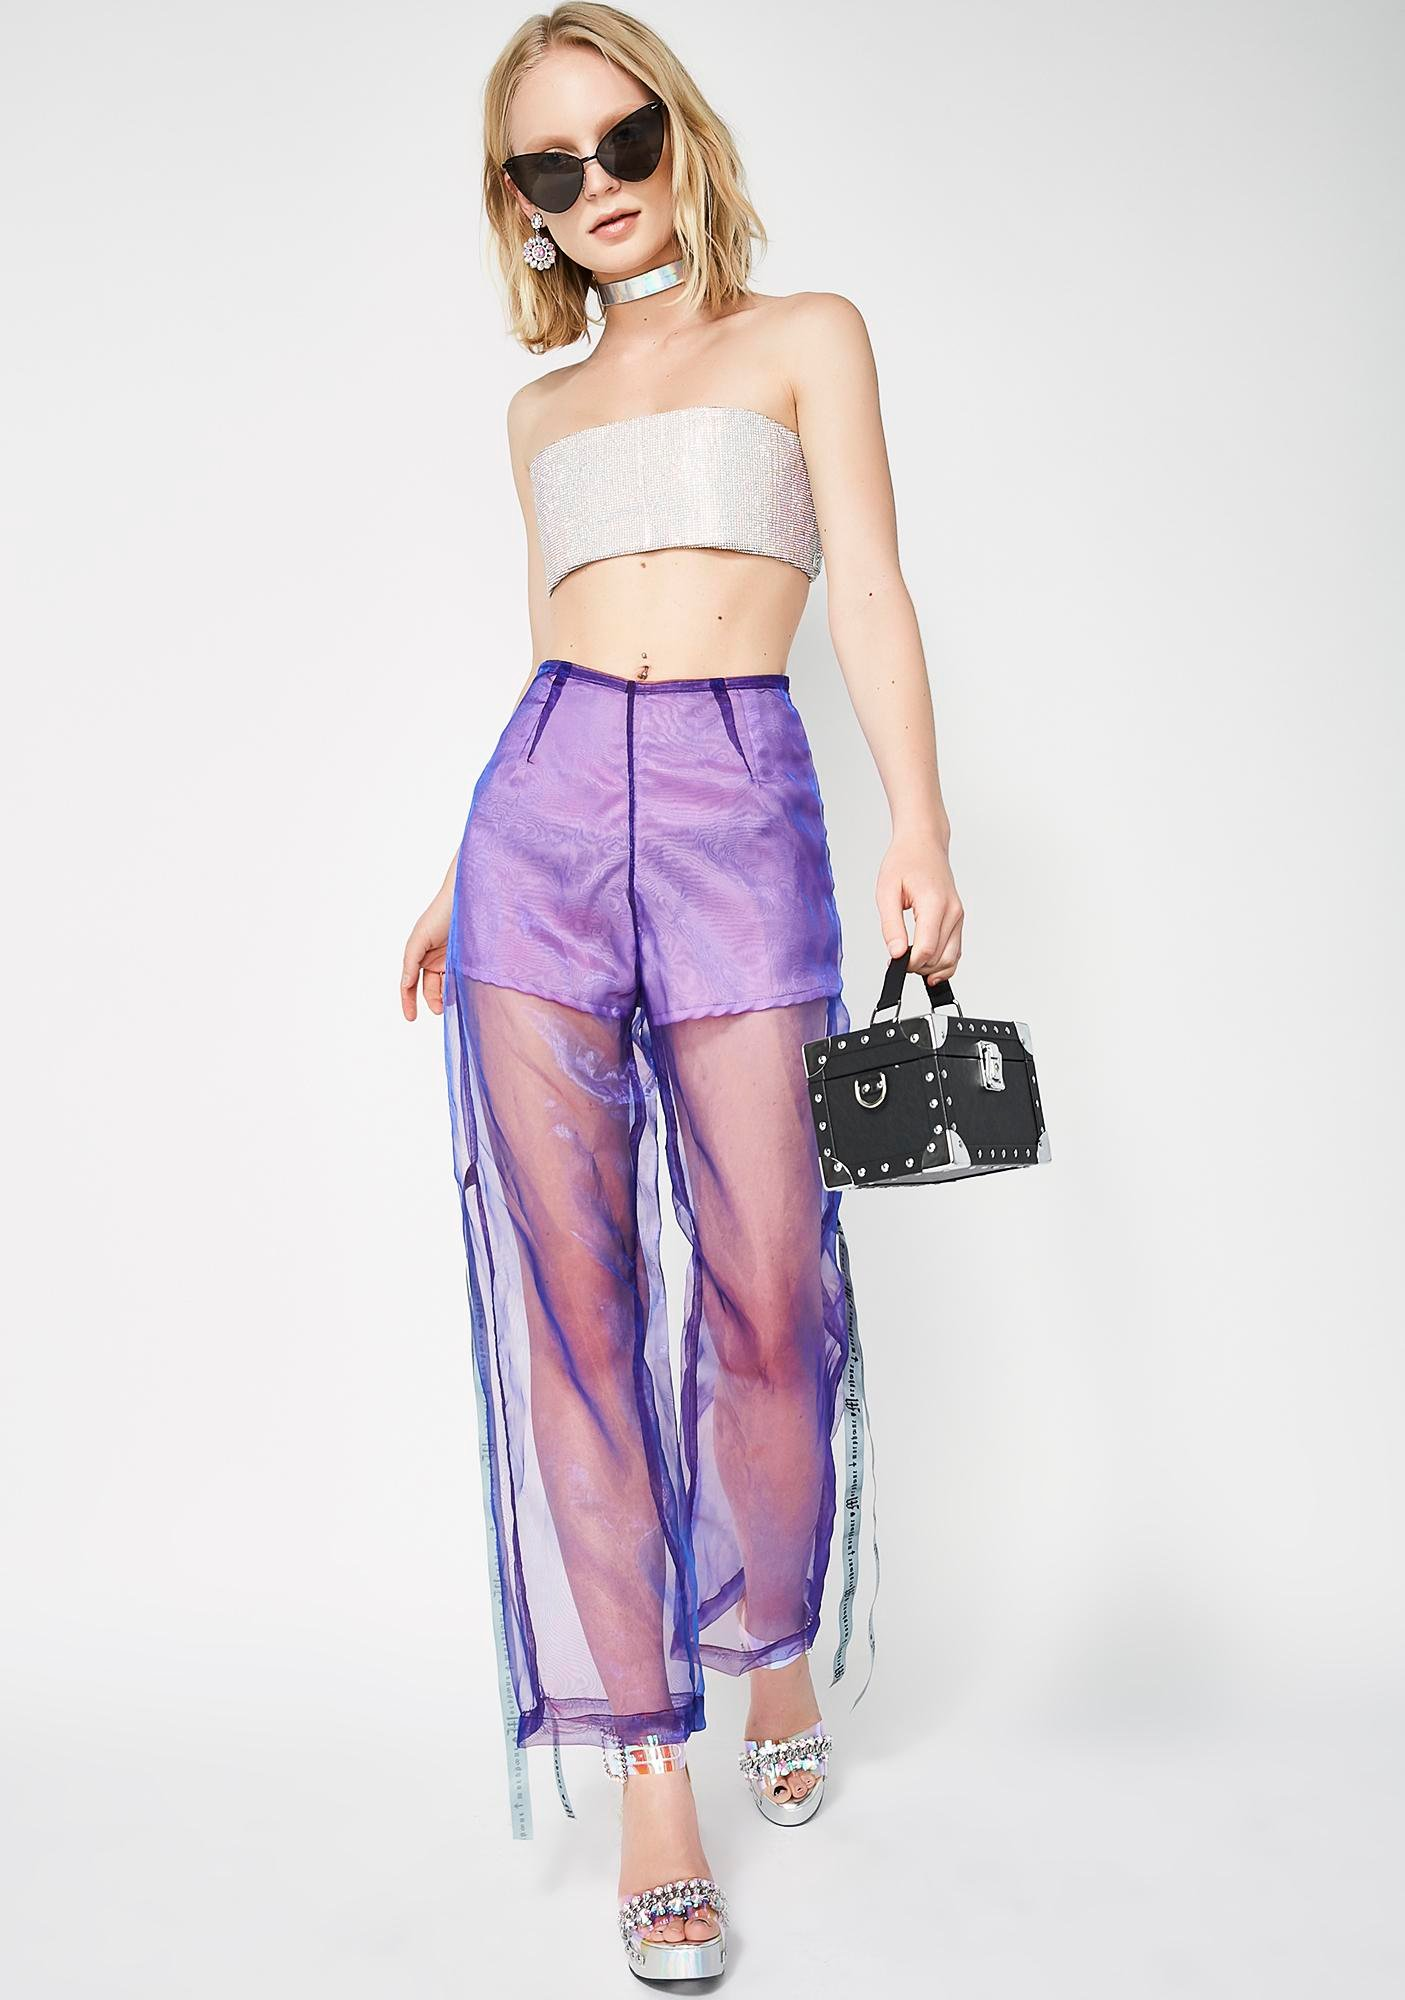 Morph8ne Hoax Trousers